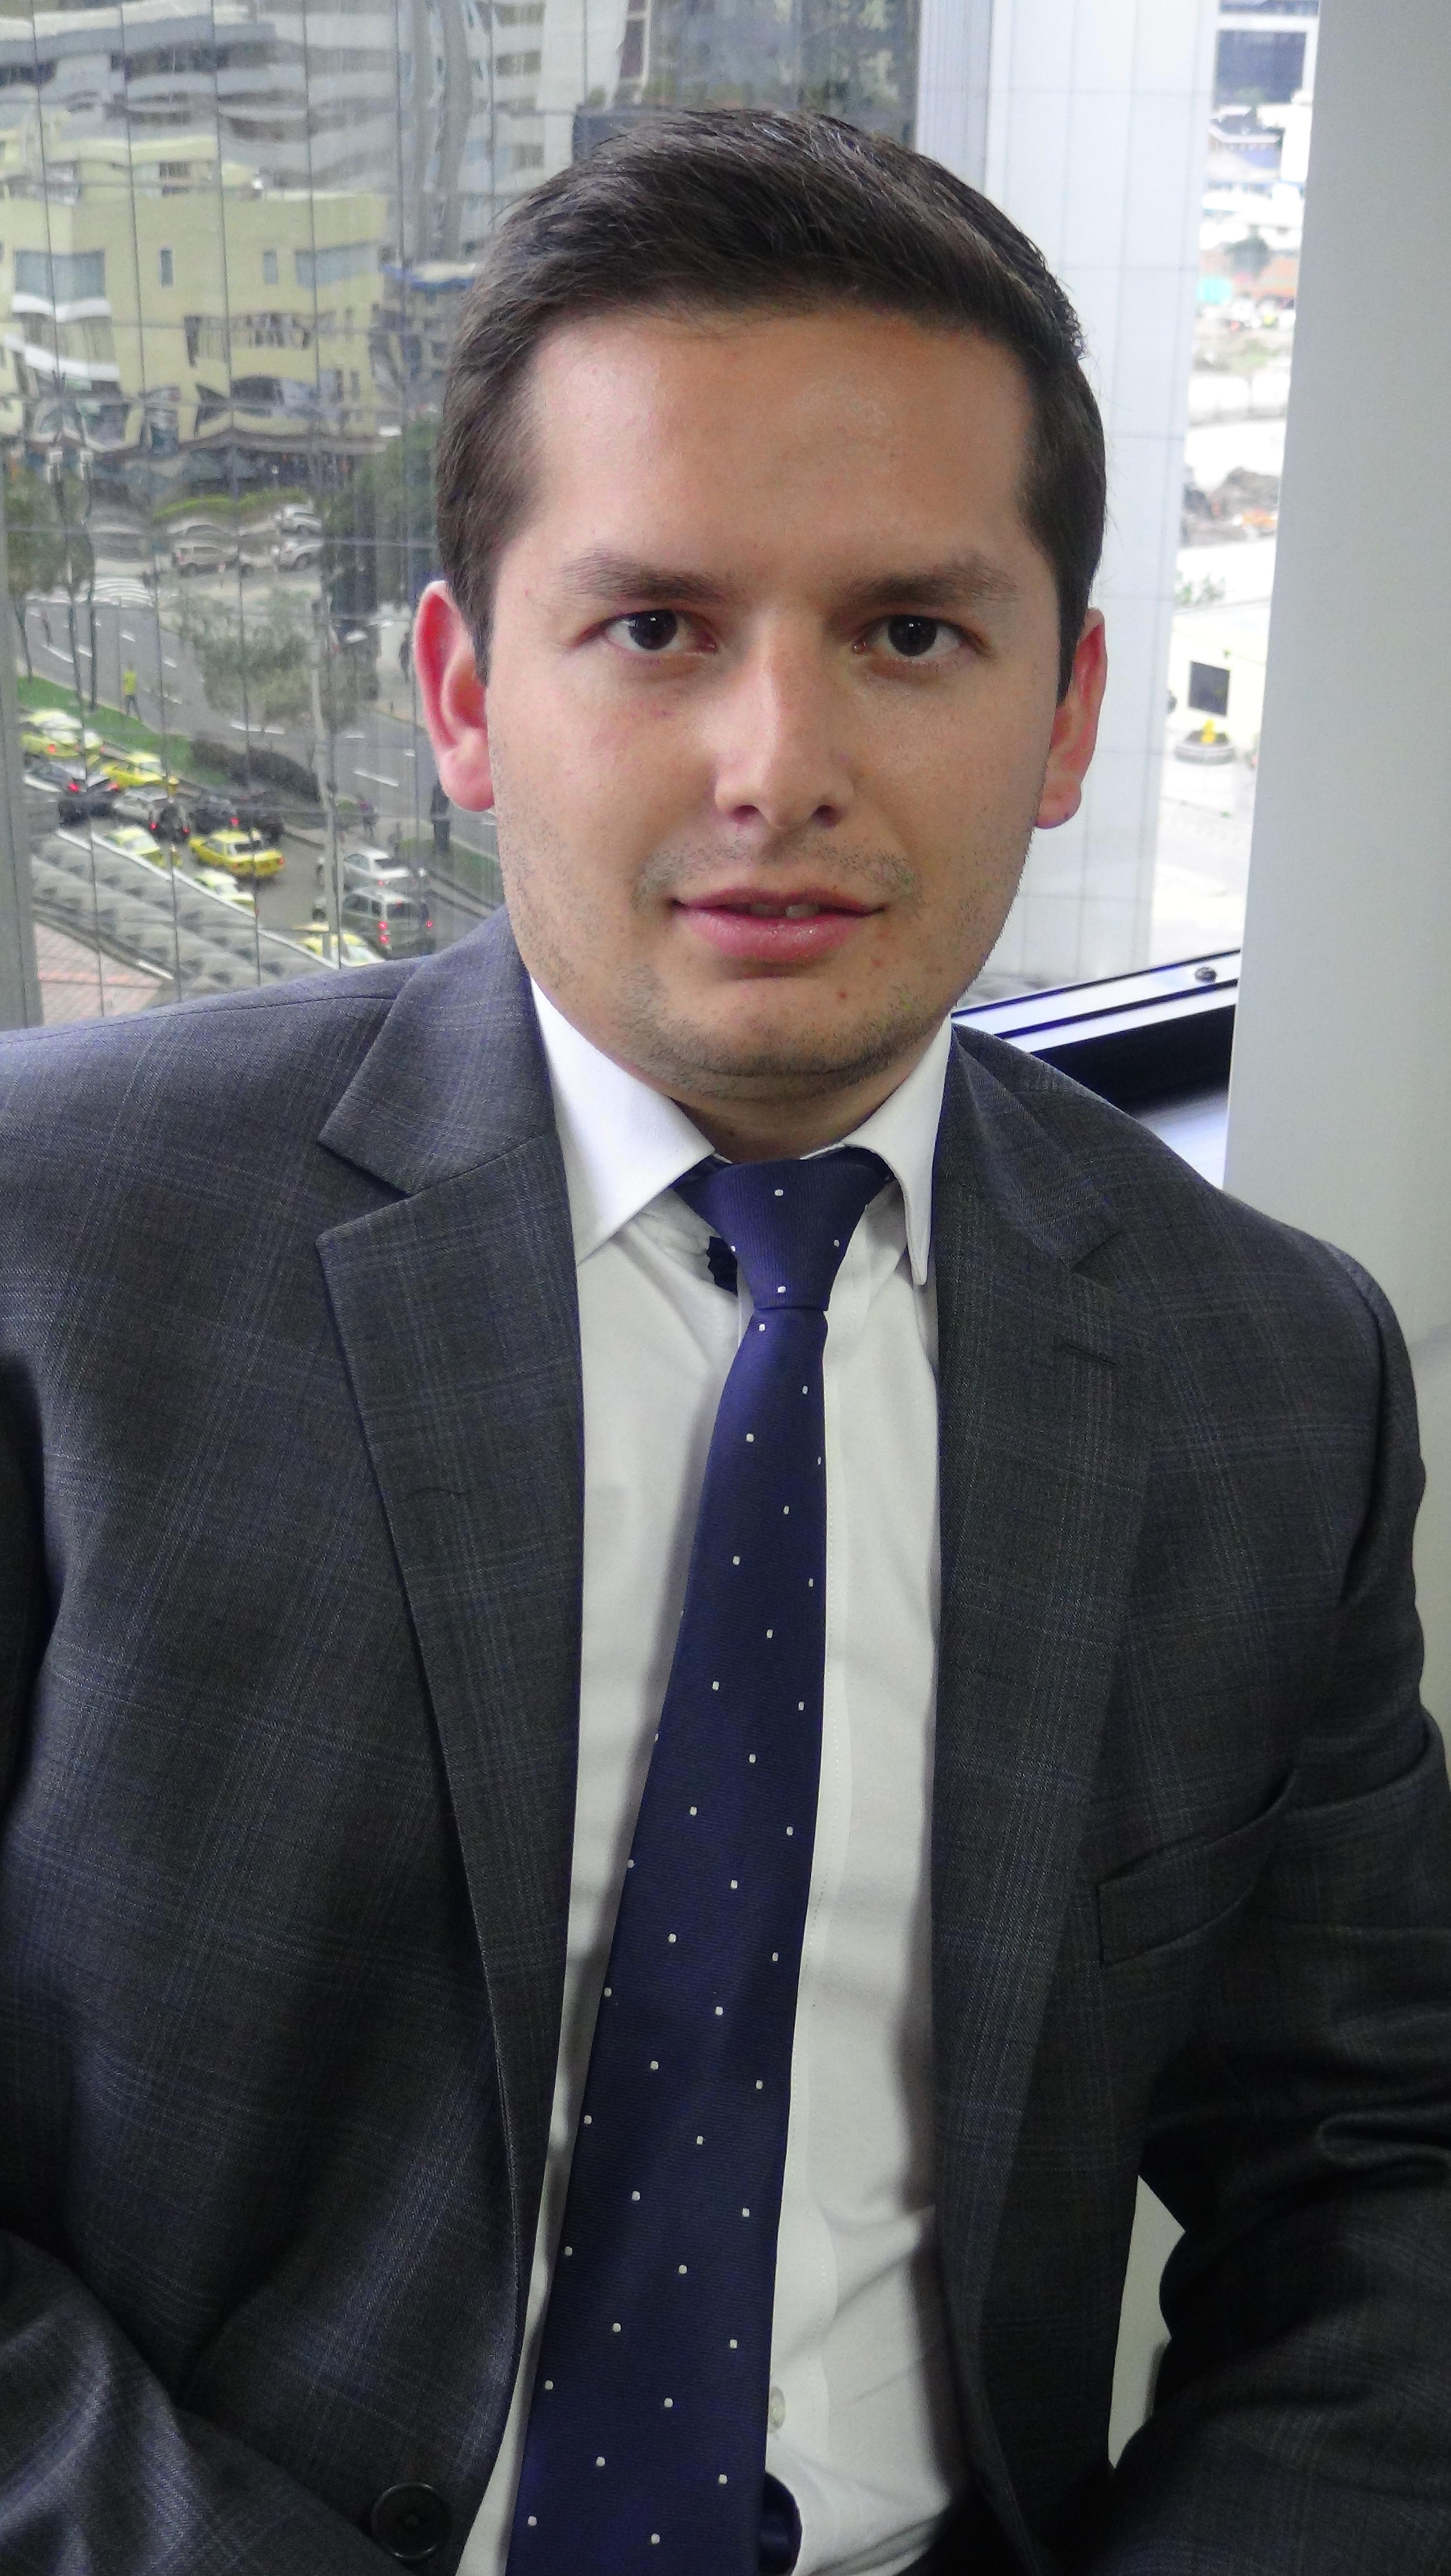 Esteban Hidalgo